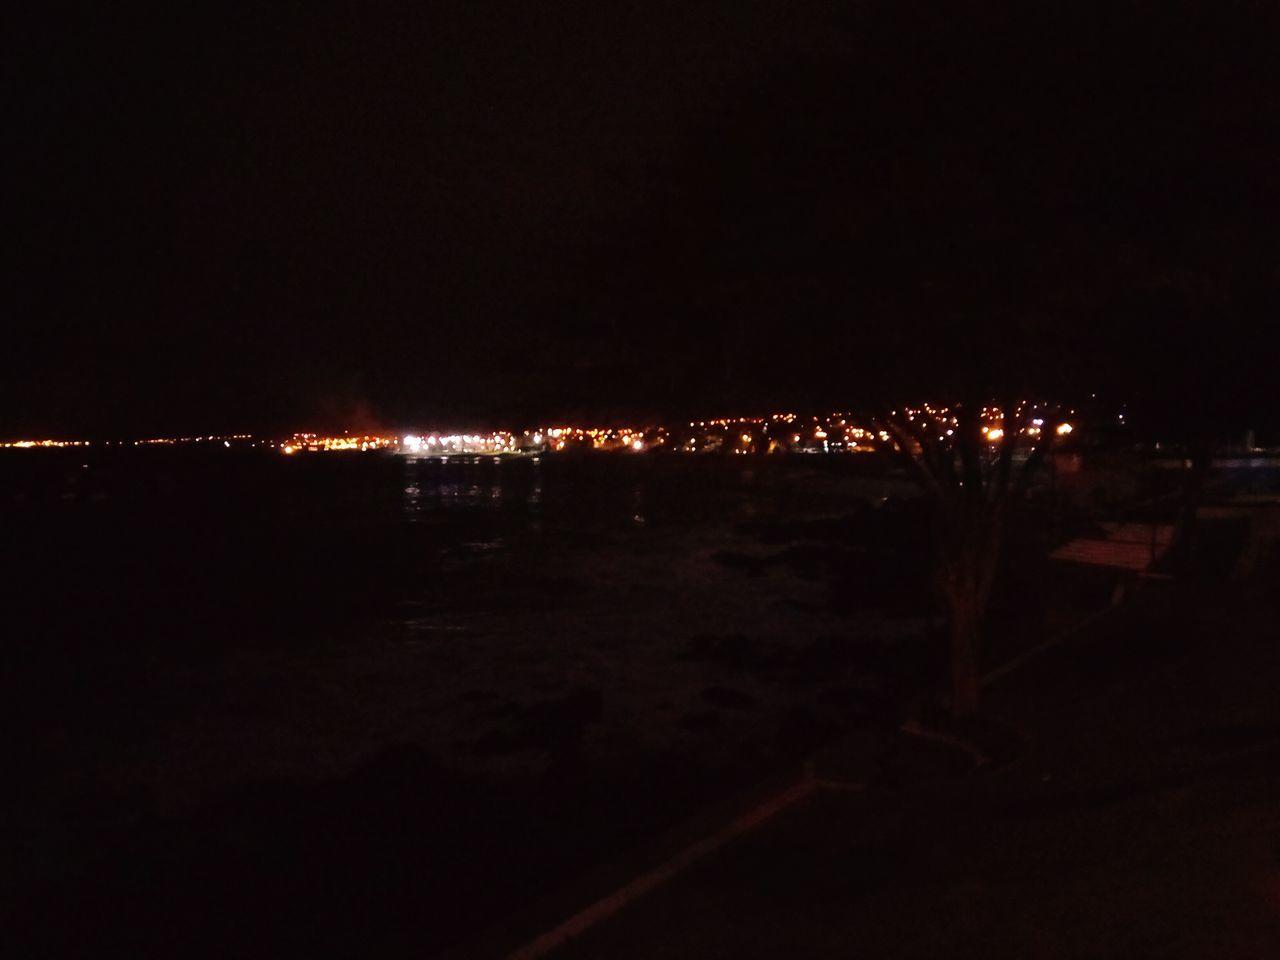 night, illuminated, dark, no people, cityscape, outdoors, city, architecture, sky